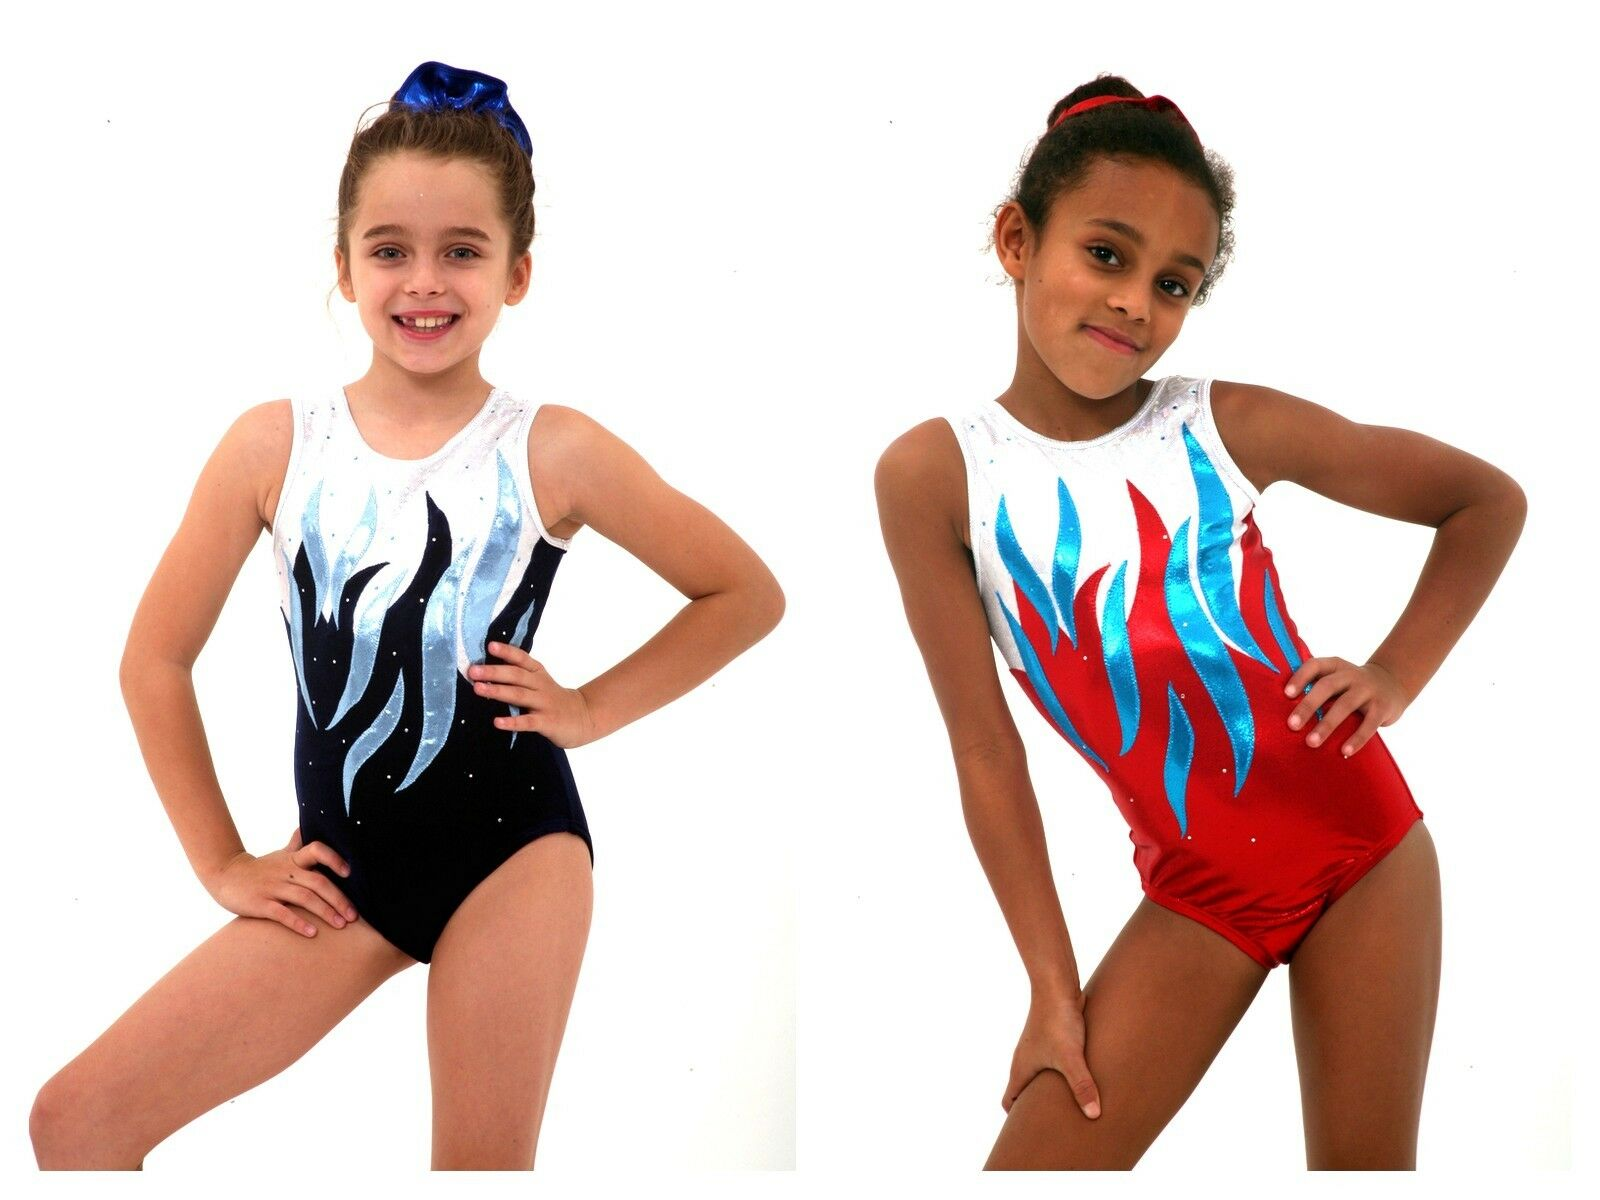 All Sizes Nevada Girls Gymnastics Leotard 26,28,30,32,34,36,38 Foil or Velour